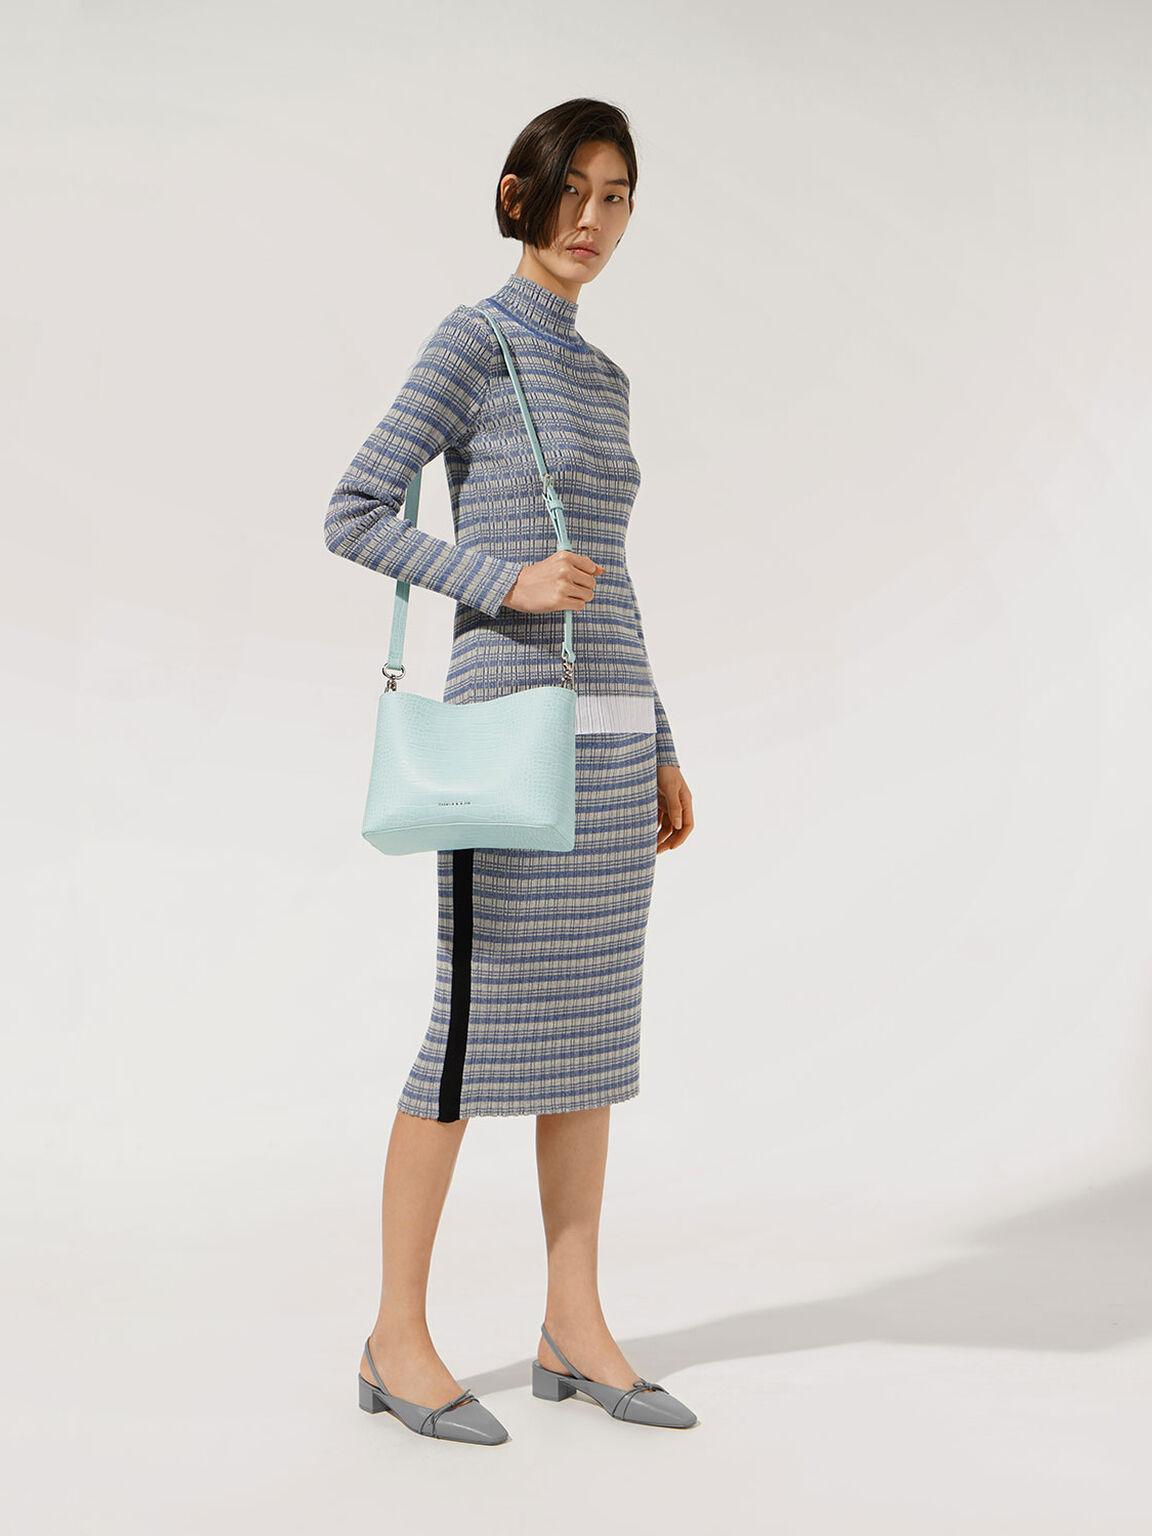 Croc-Effect Acrylic Handle Bucket Bag, Mint Blue, hi-res